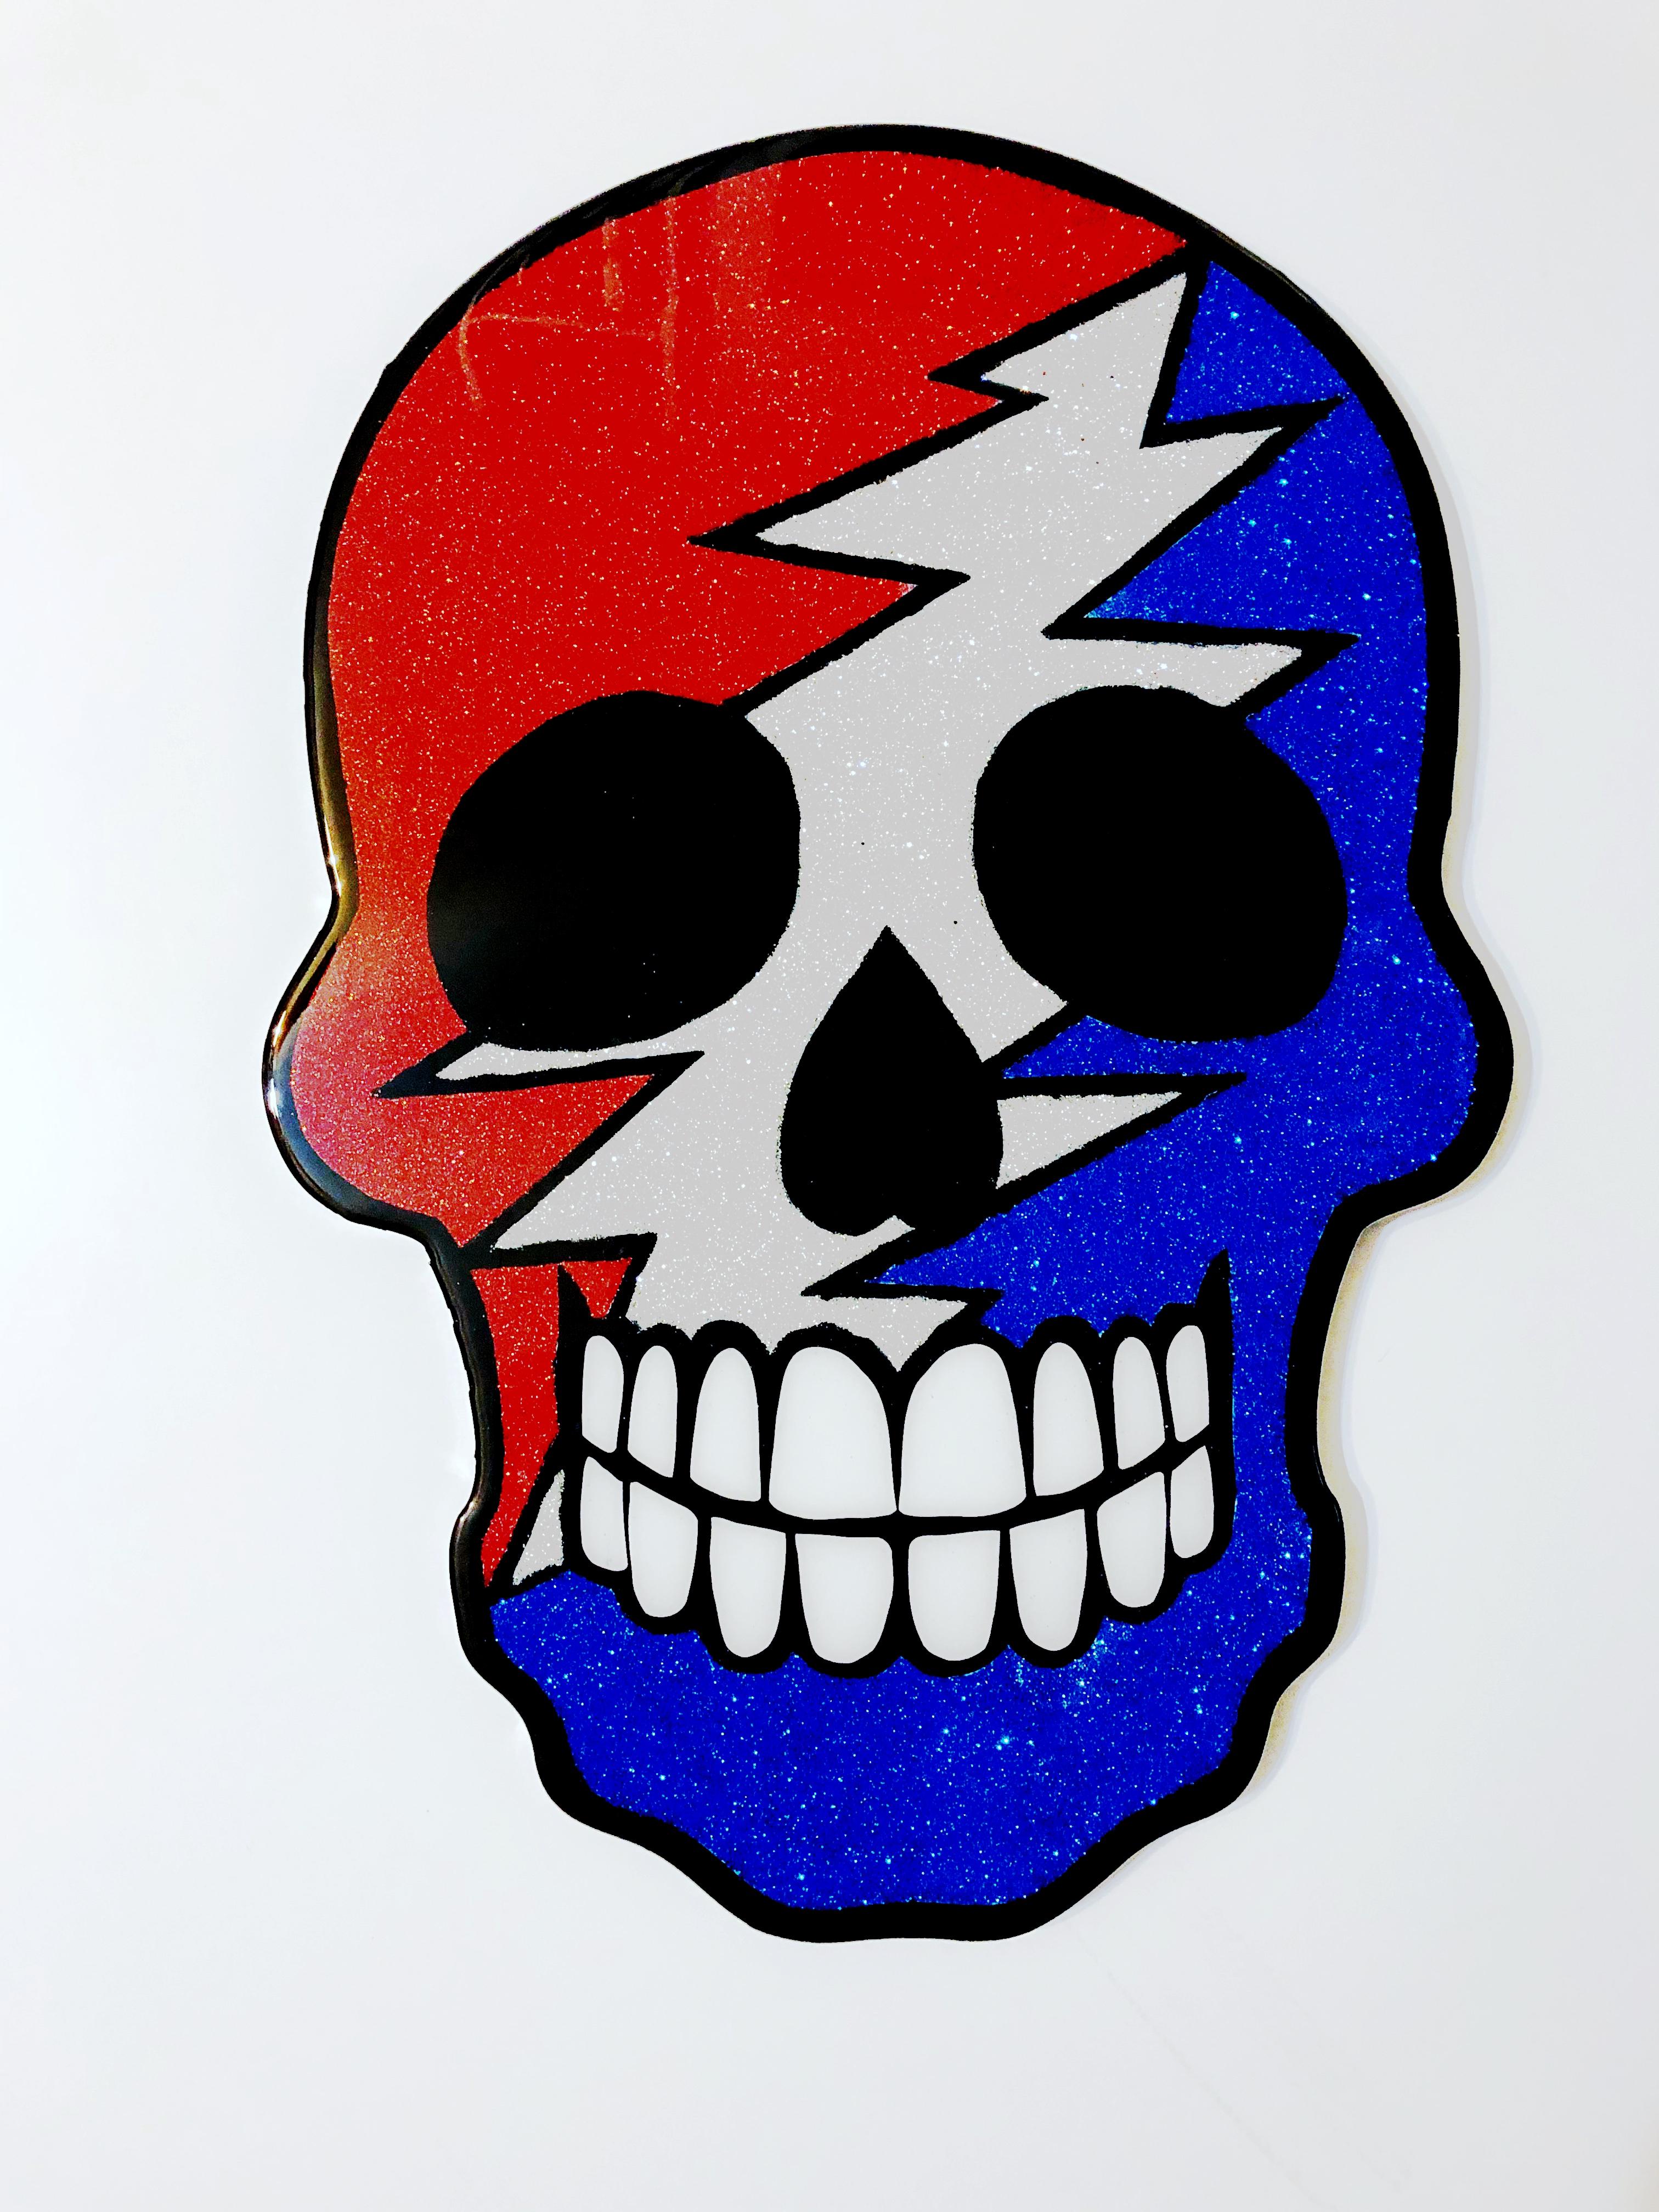 Epic Grateful Skull